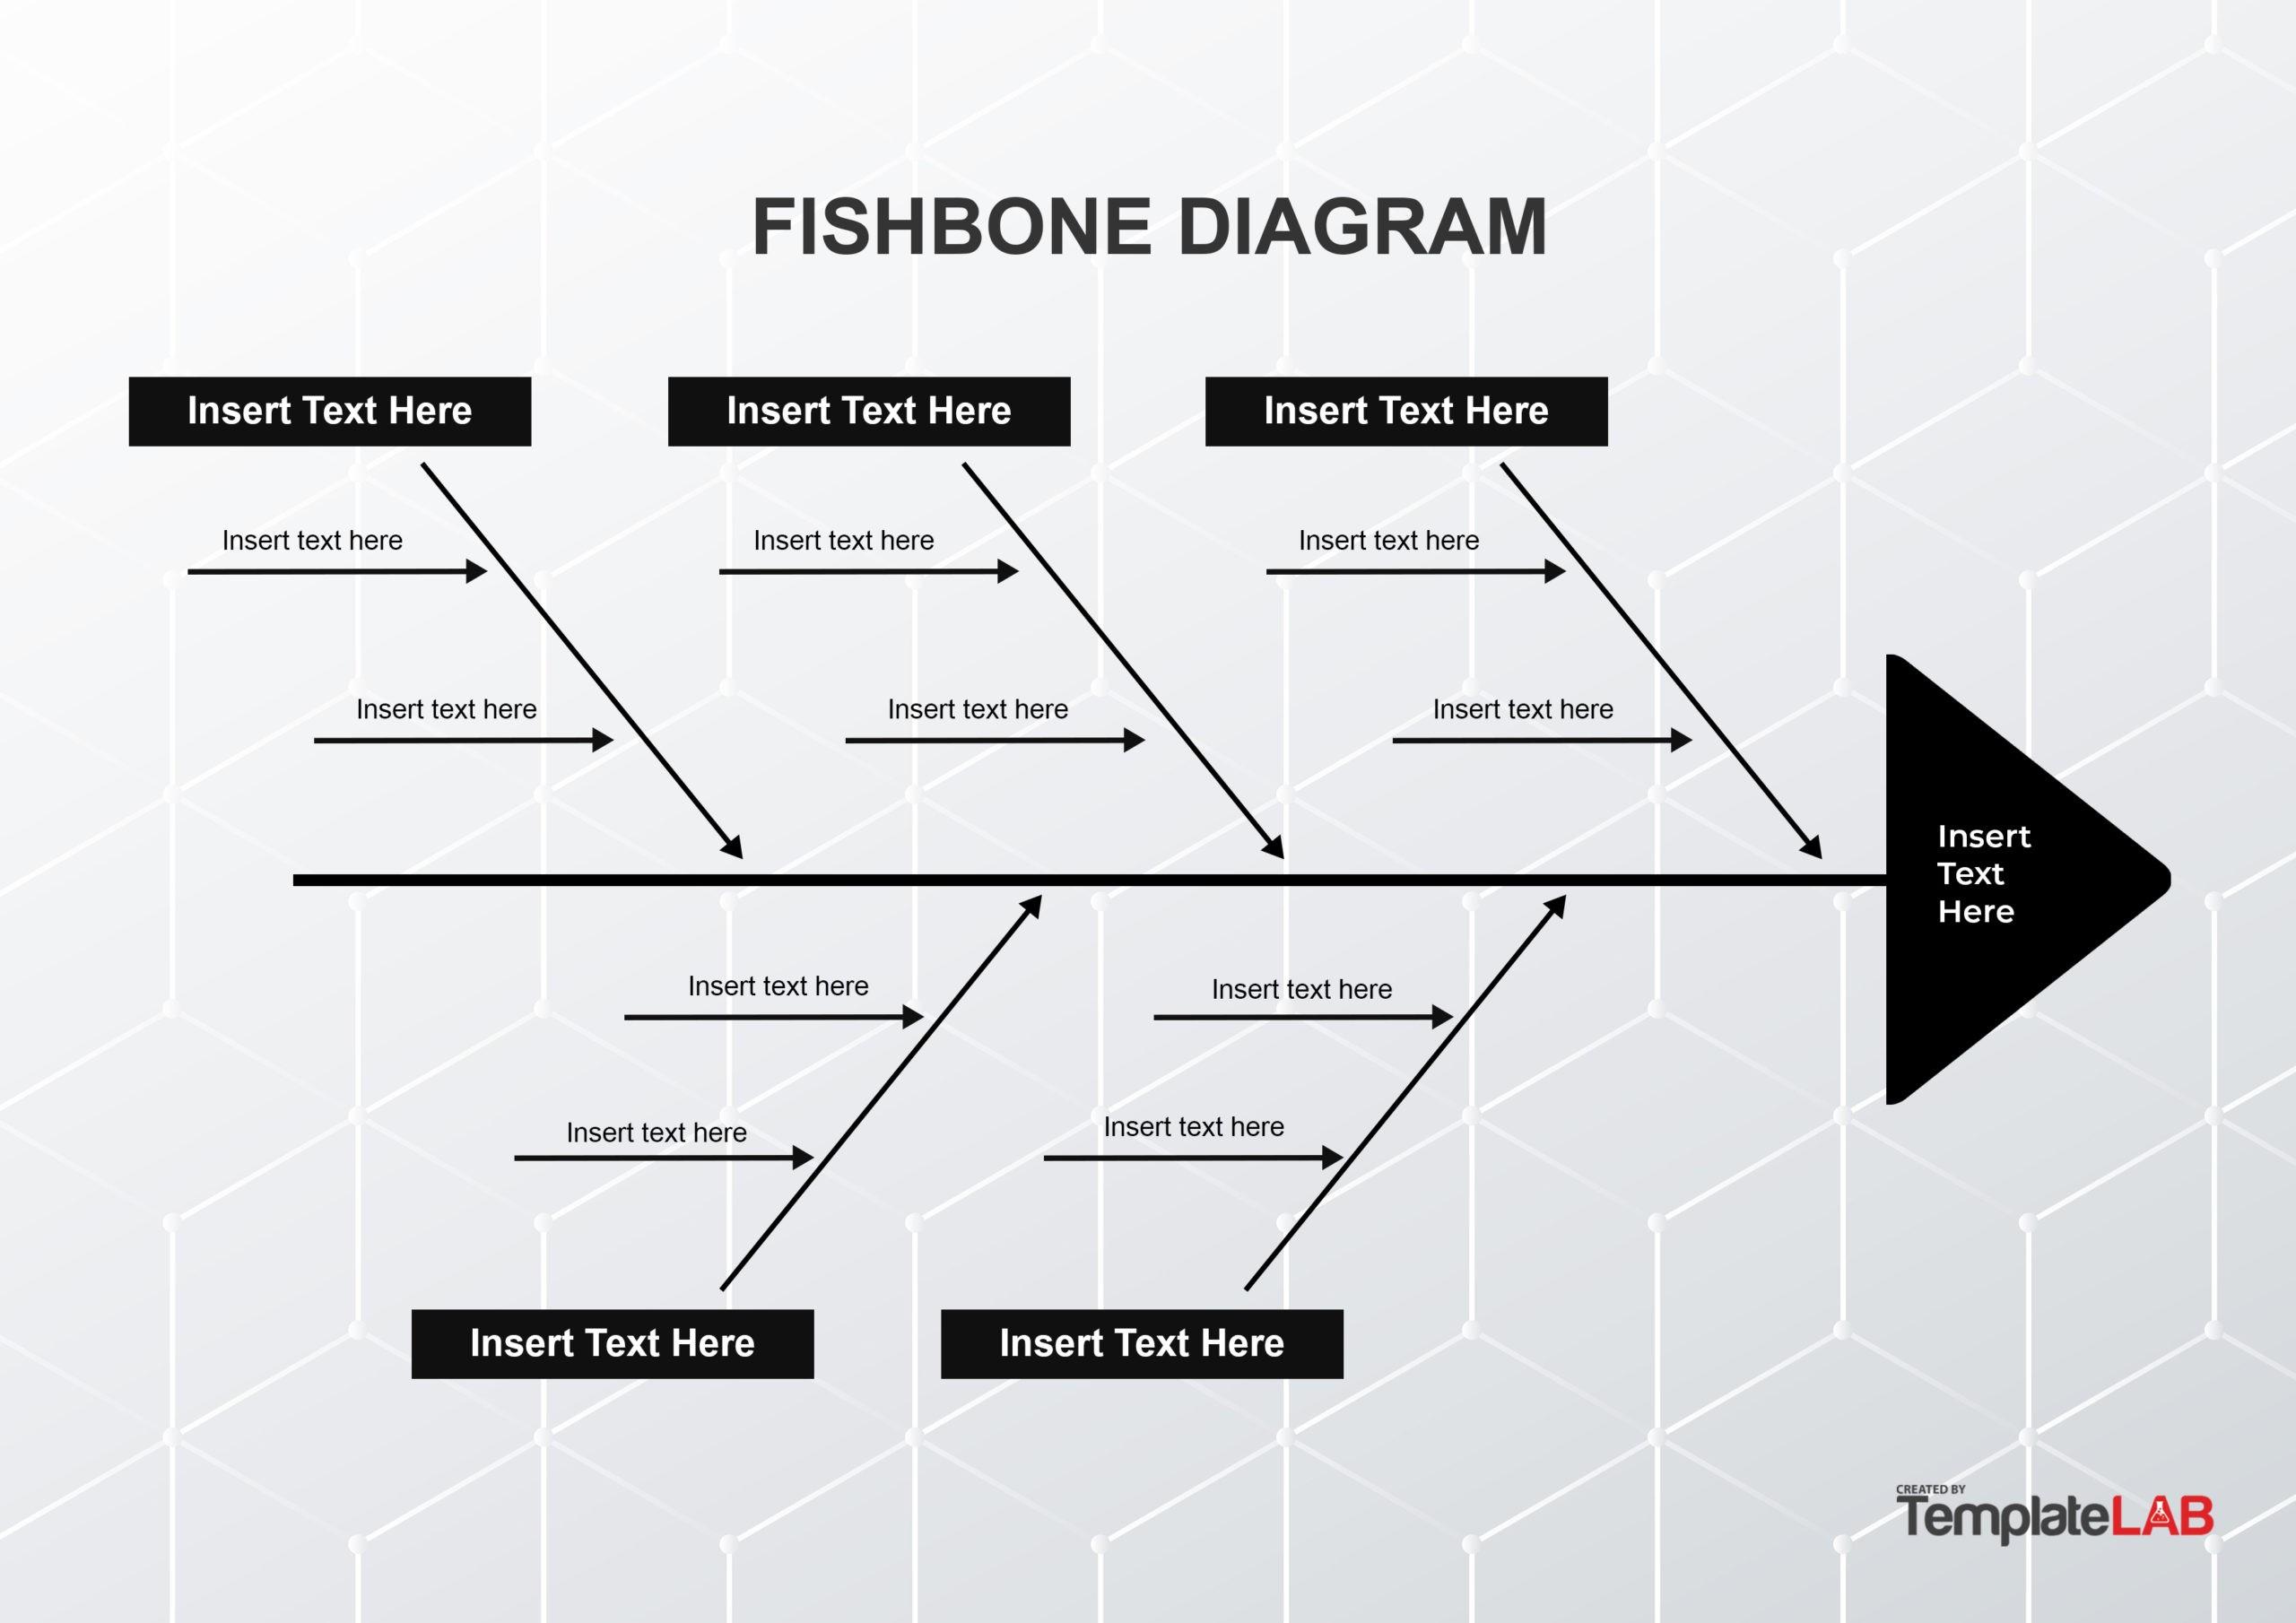 Free Fishbone Diagram Template 12 - TemplateLab.com